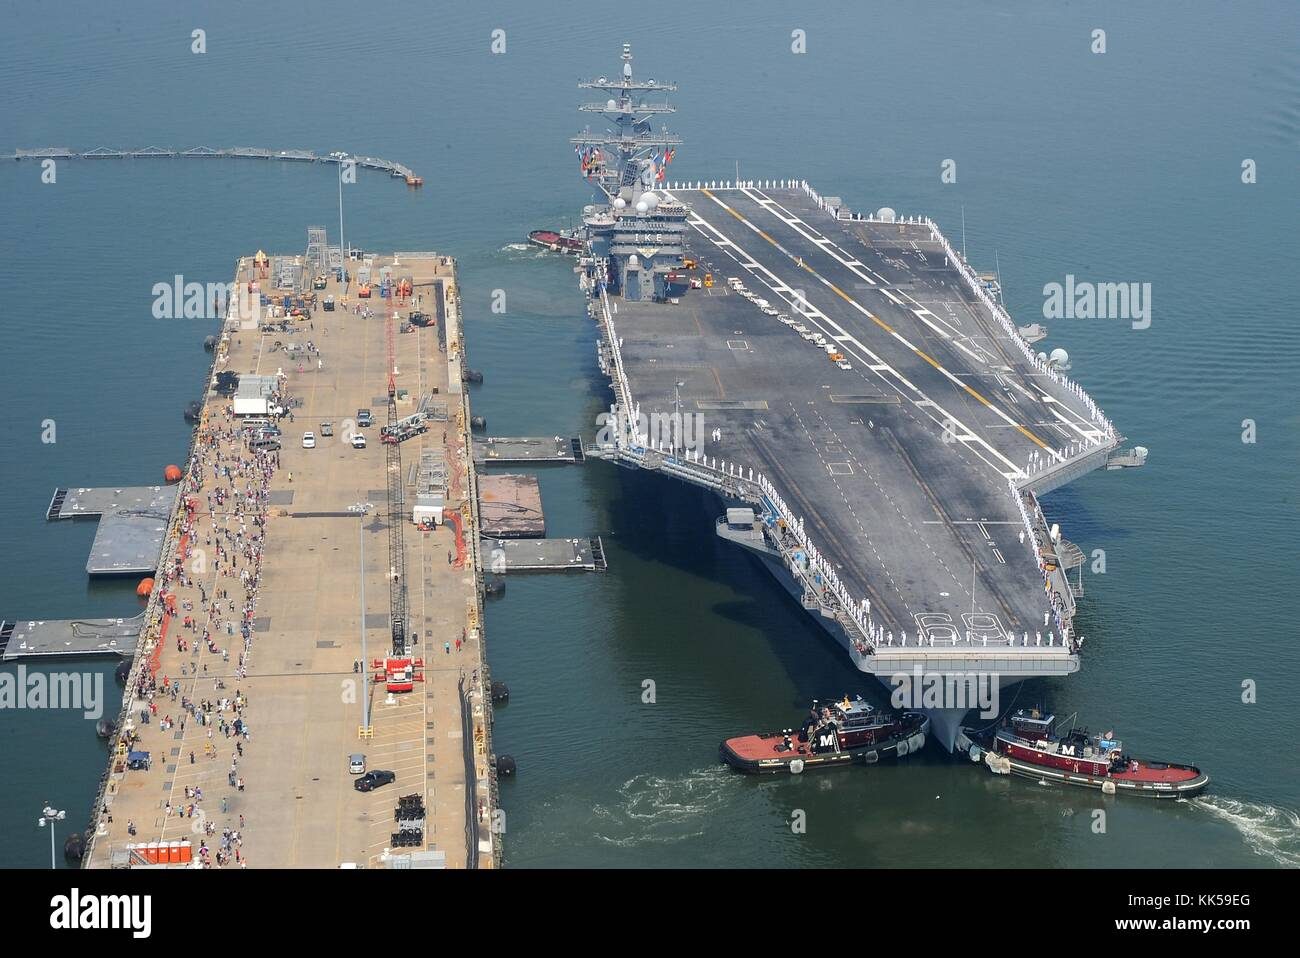 The Nimitz-class aircraft carrier USS Dwight D Eisenhower CVN 69 departs Naval Station Norfolk for a regularly scheduled - Stock Image